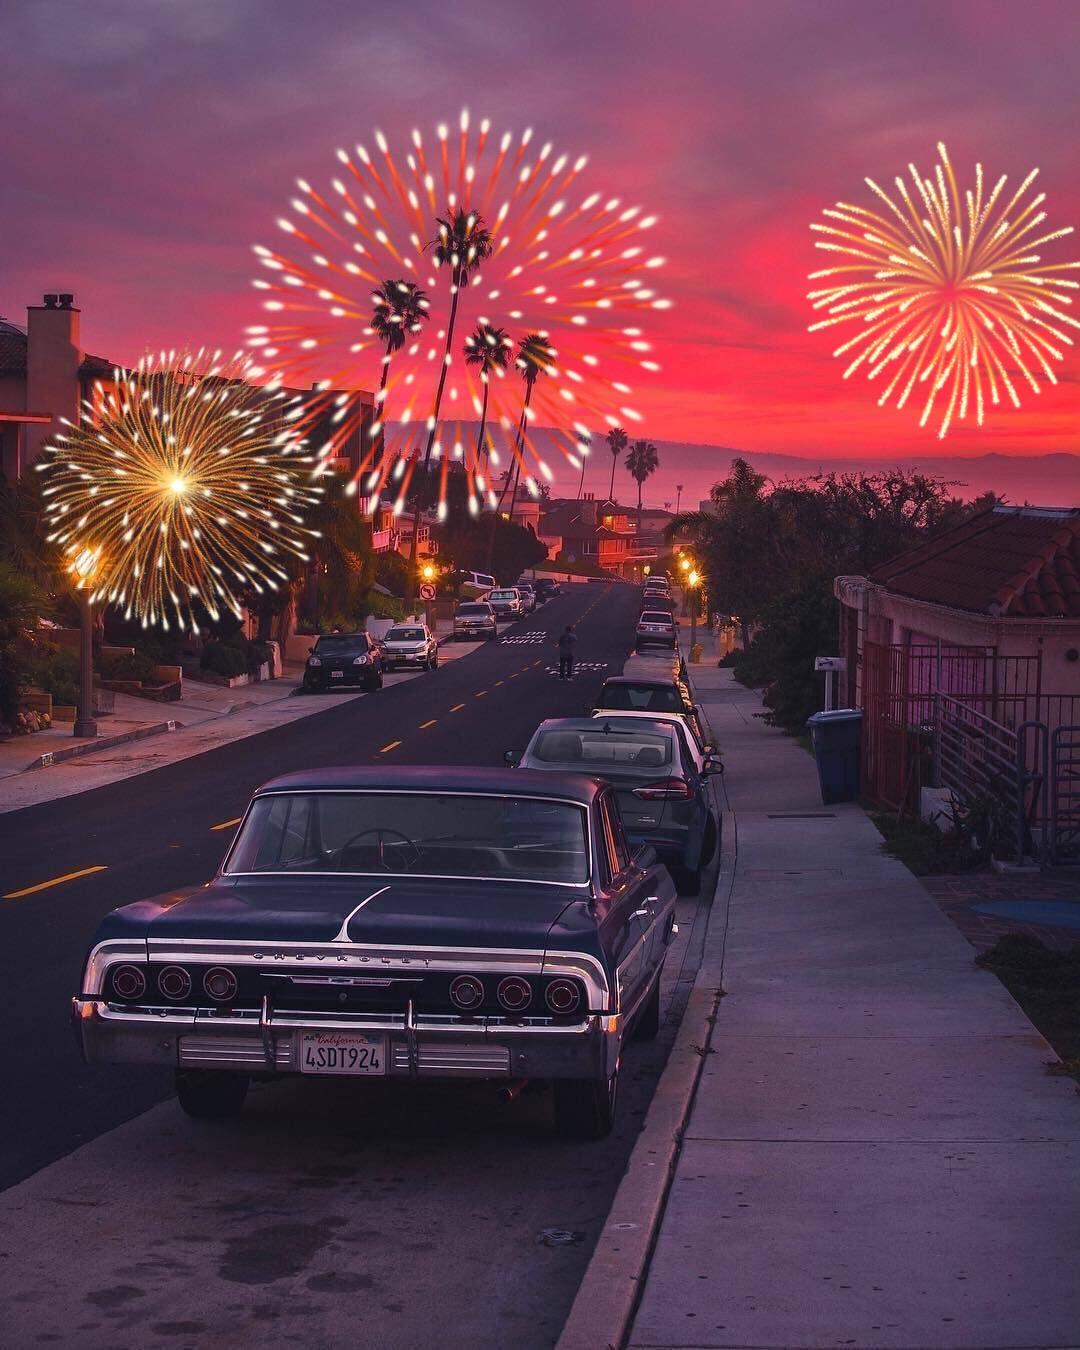 #freetoedit #4ofjuly #cars #evening #fireworks